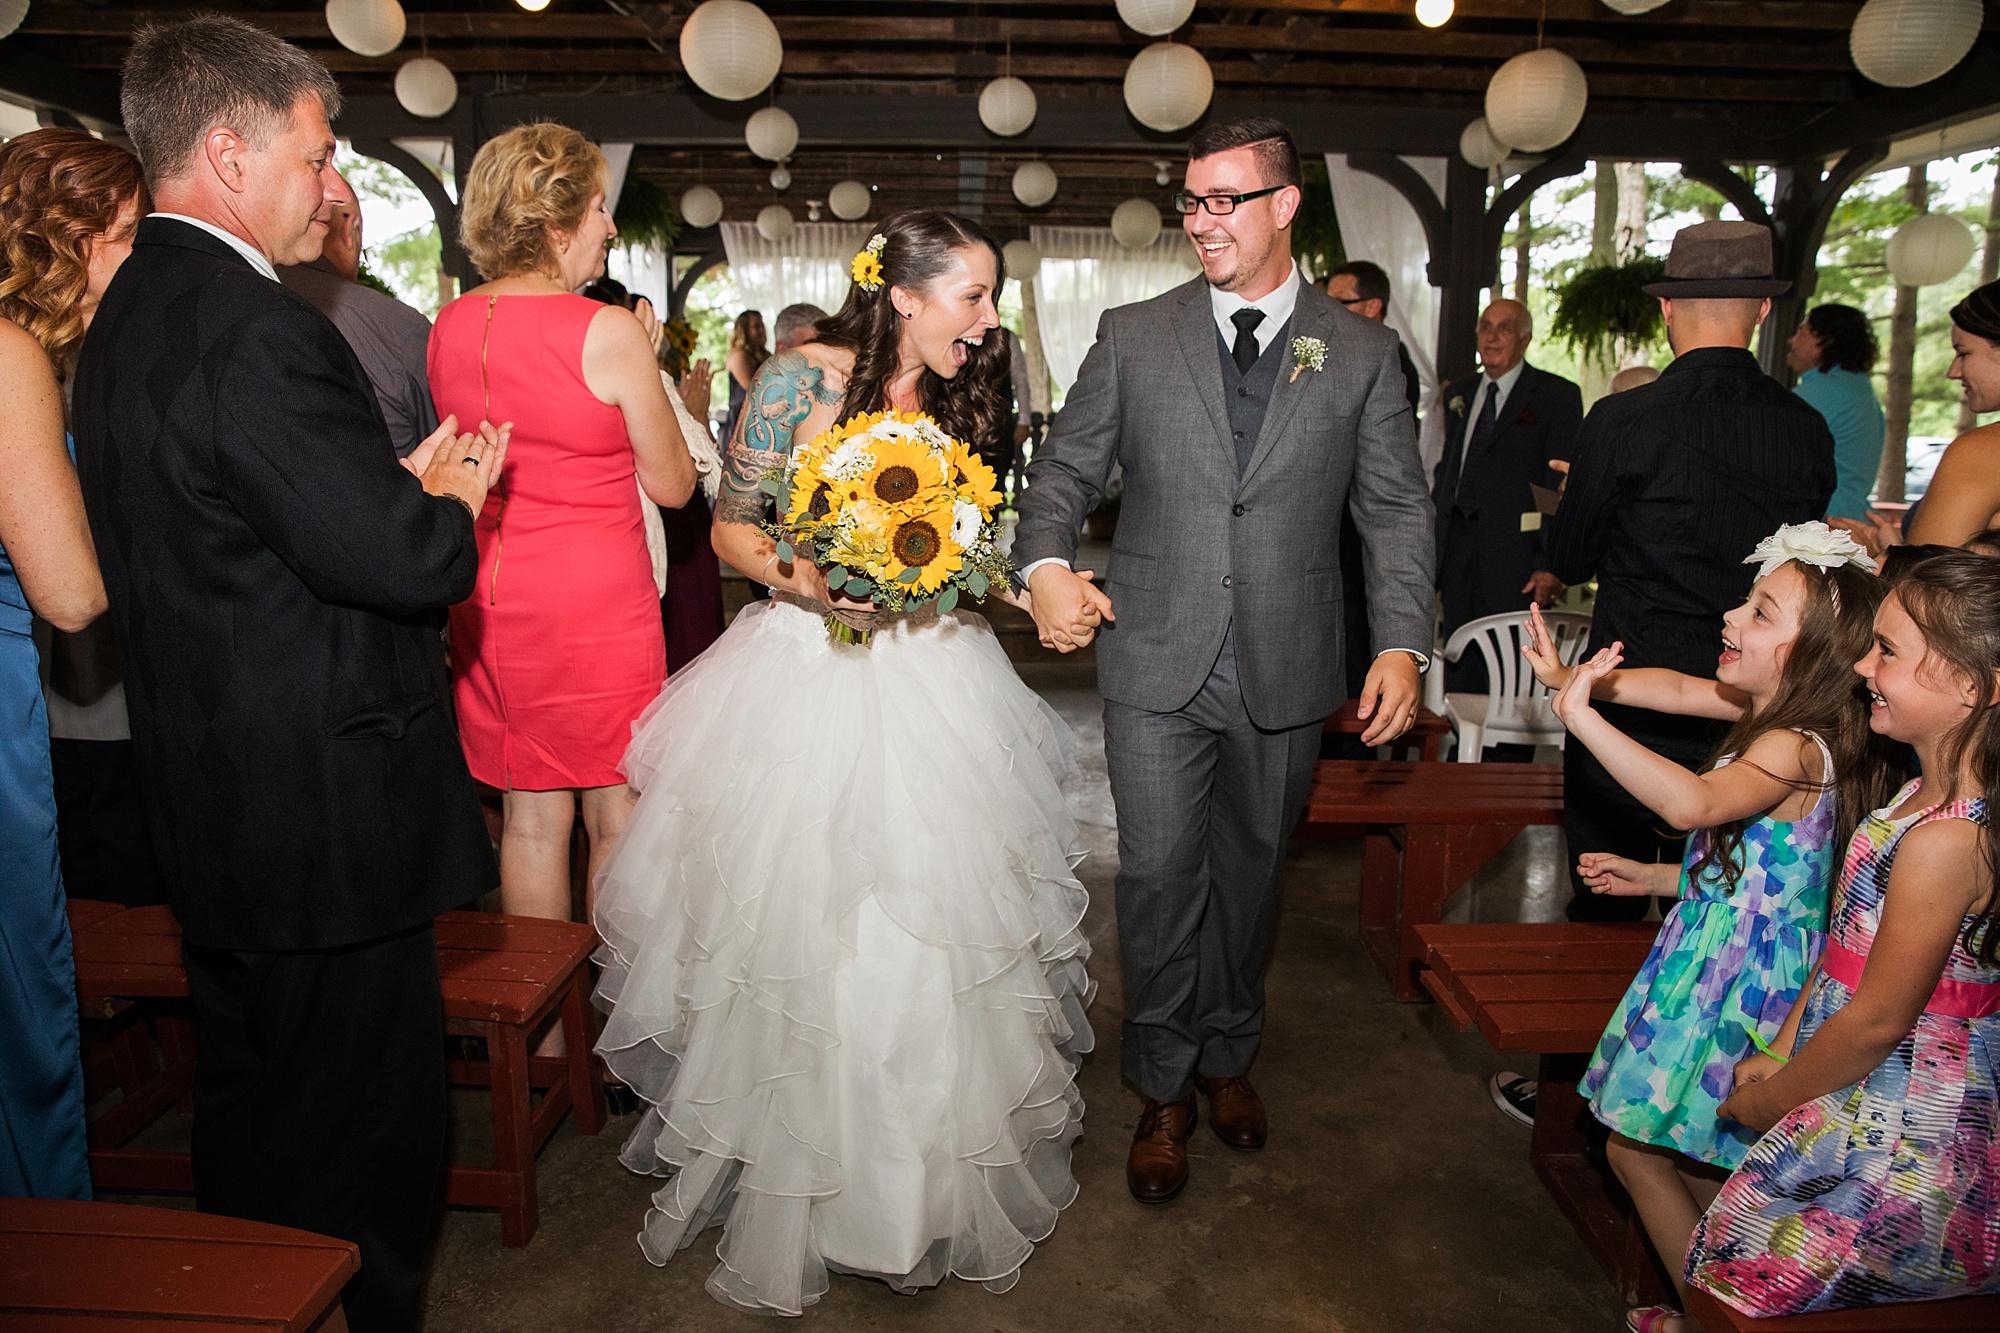 lipapark-hernderwinery-wedding_0064.jpg